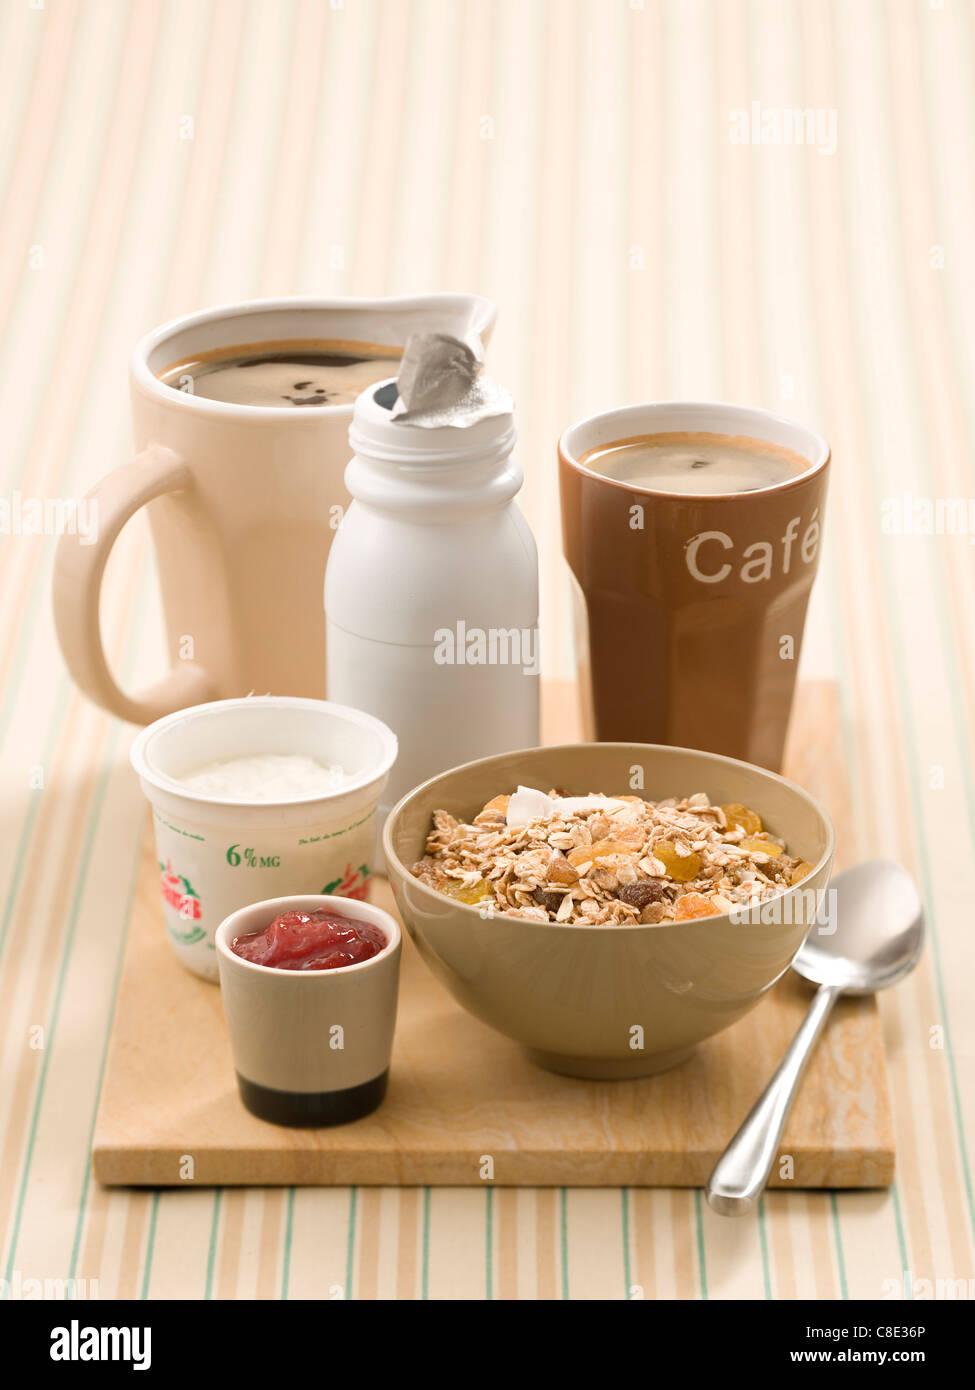 Well-balanced man's breakfast - Stock Image